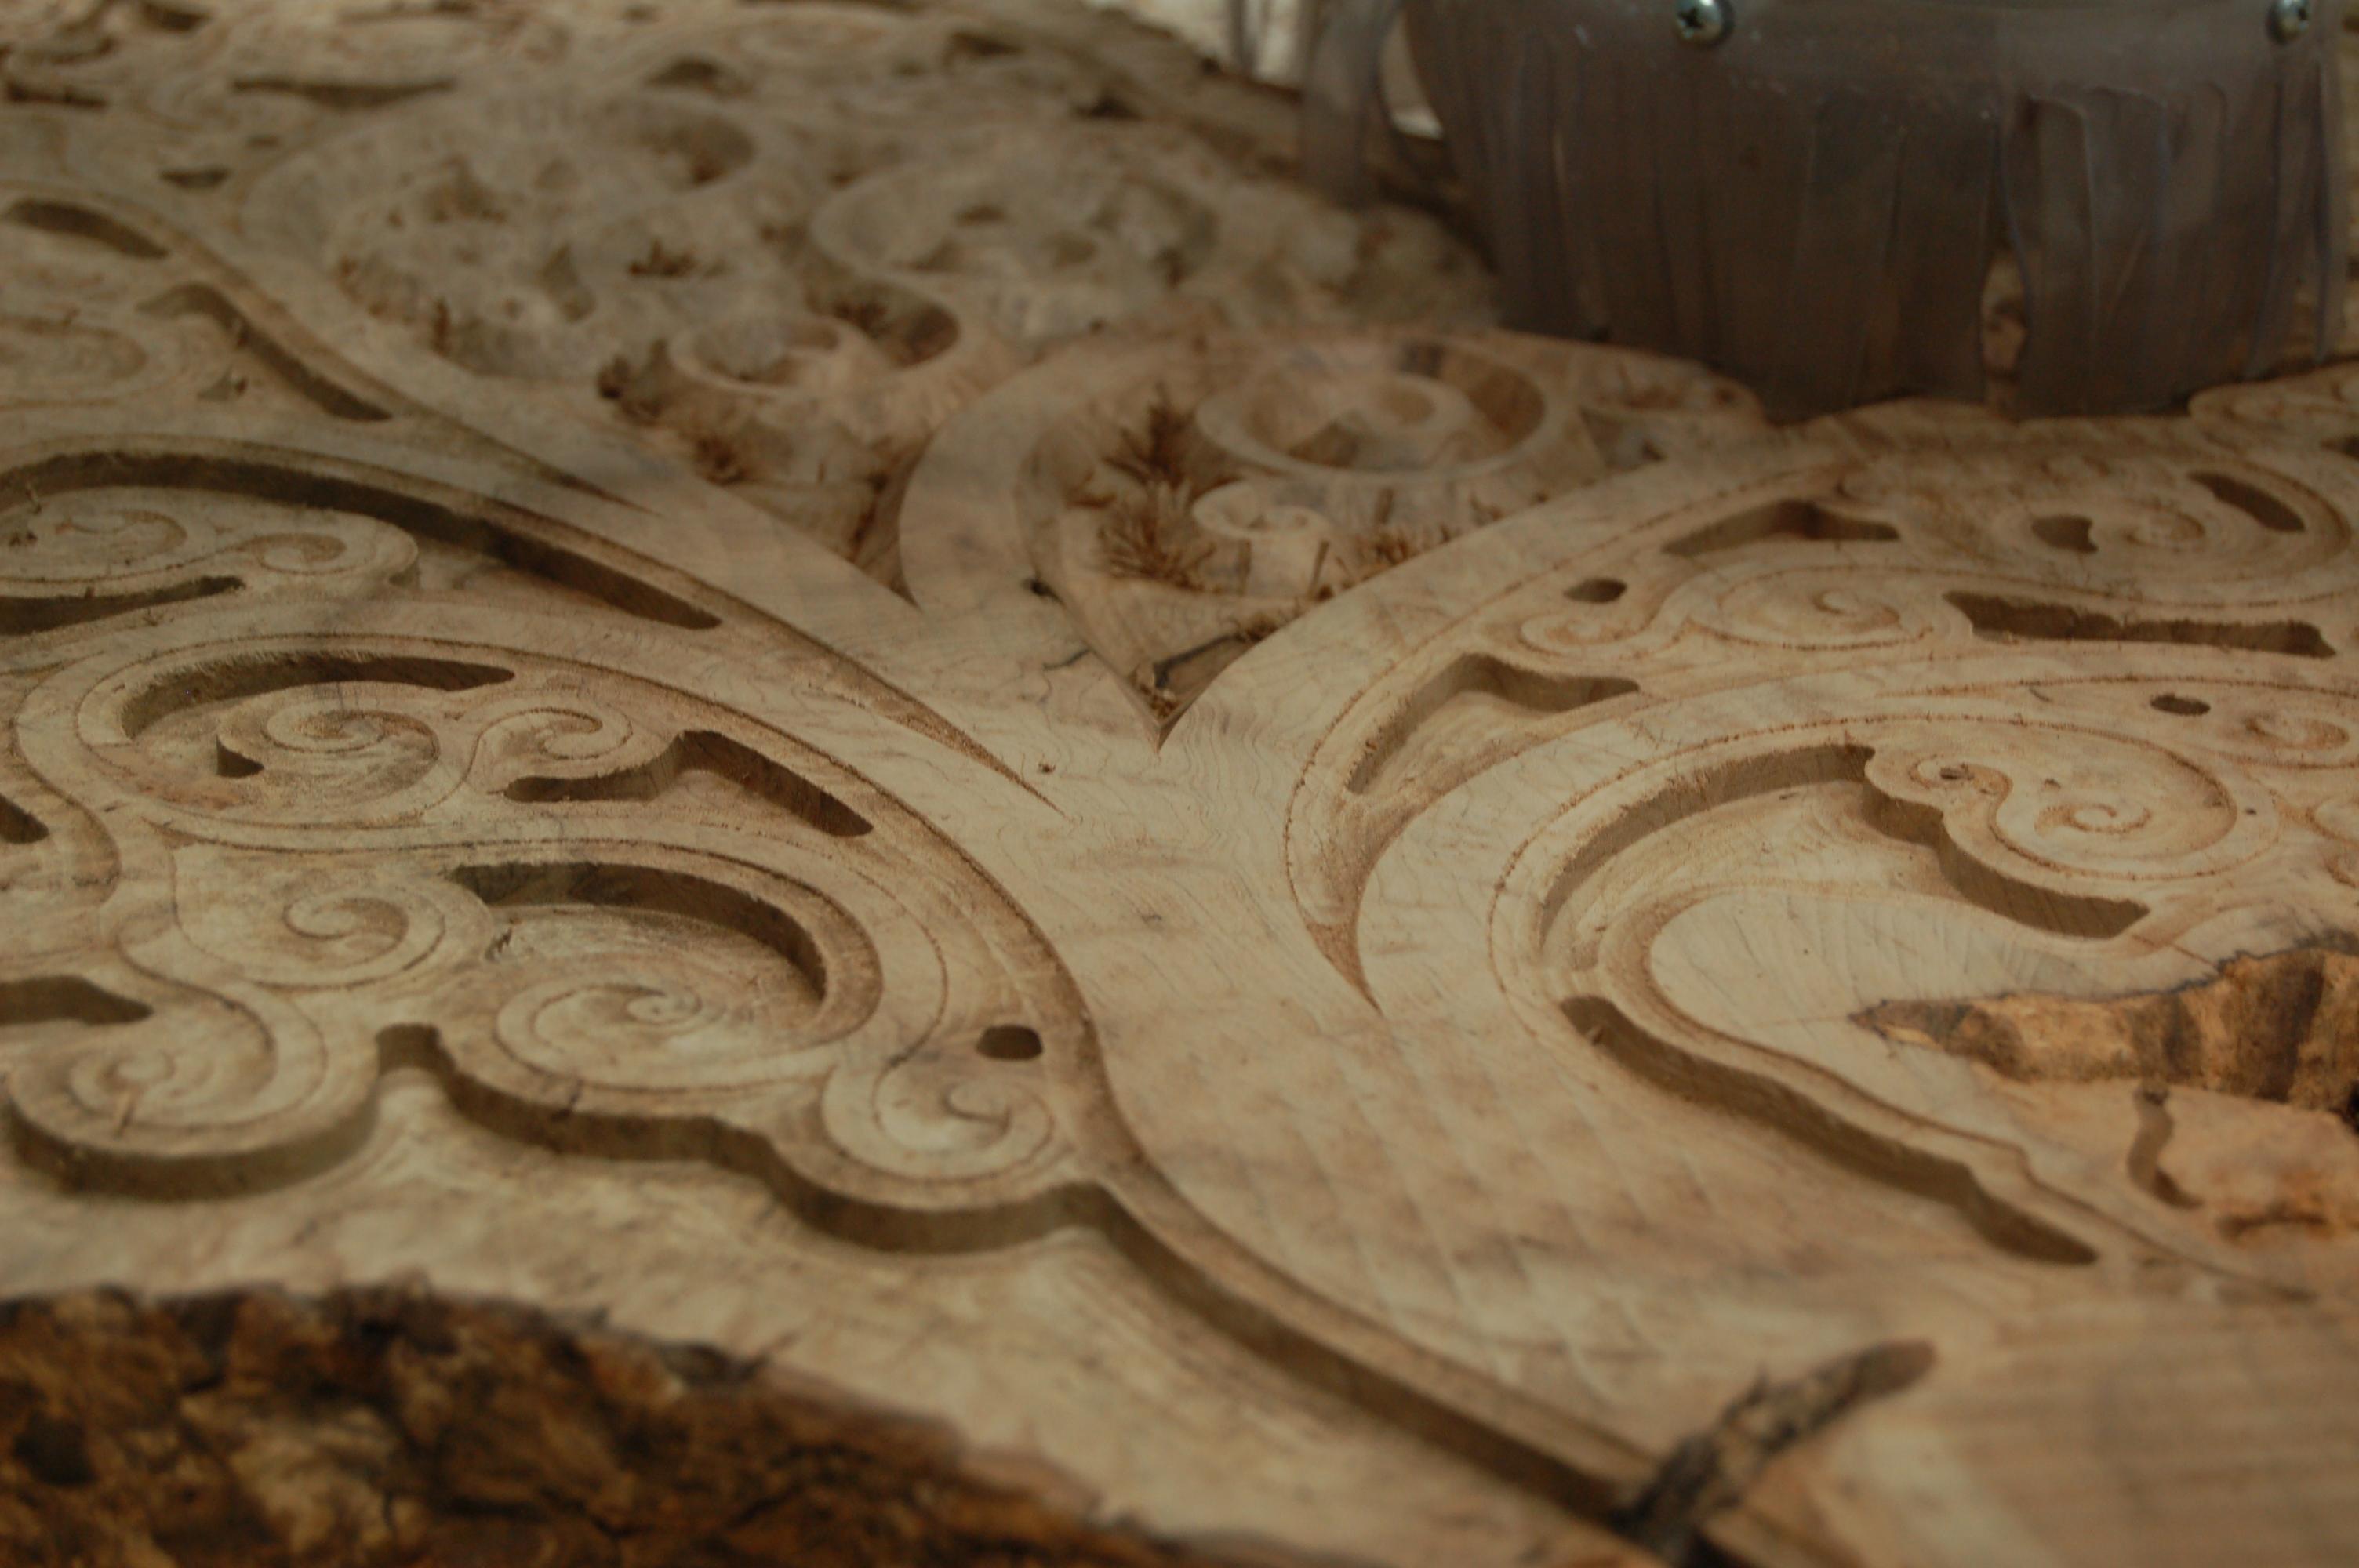 Carving custom designs into irregular shaped wood